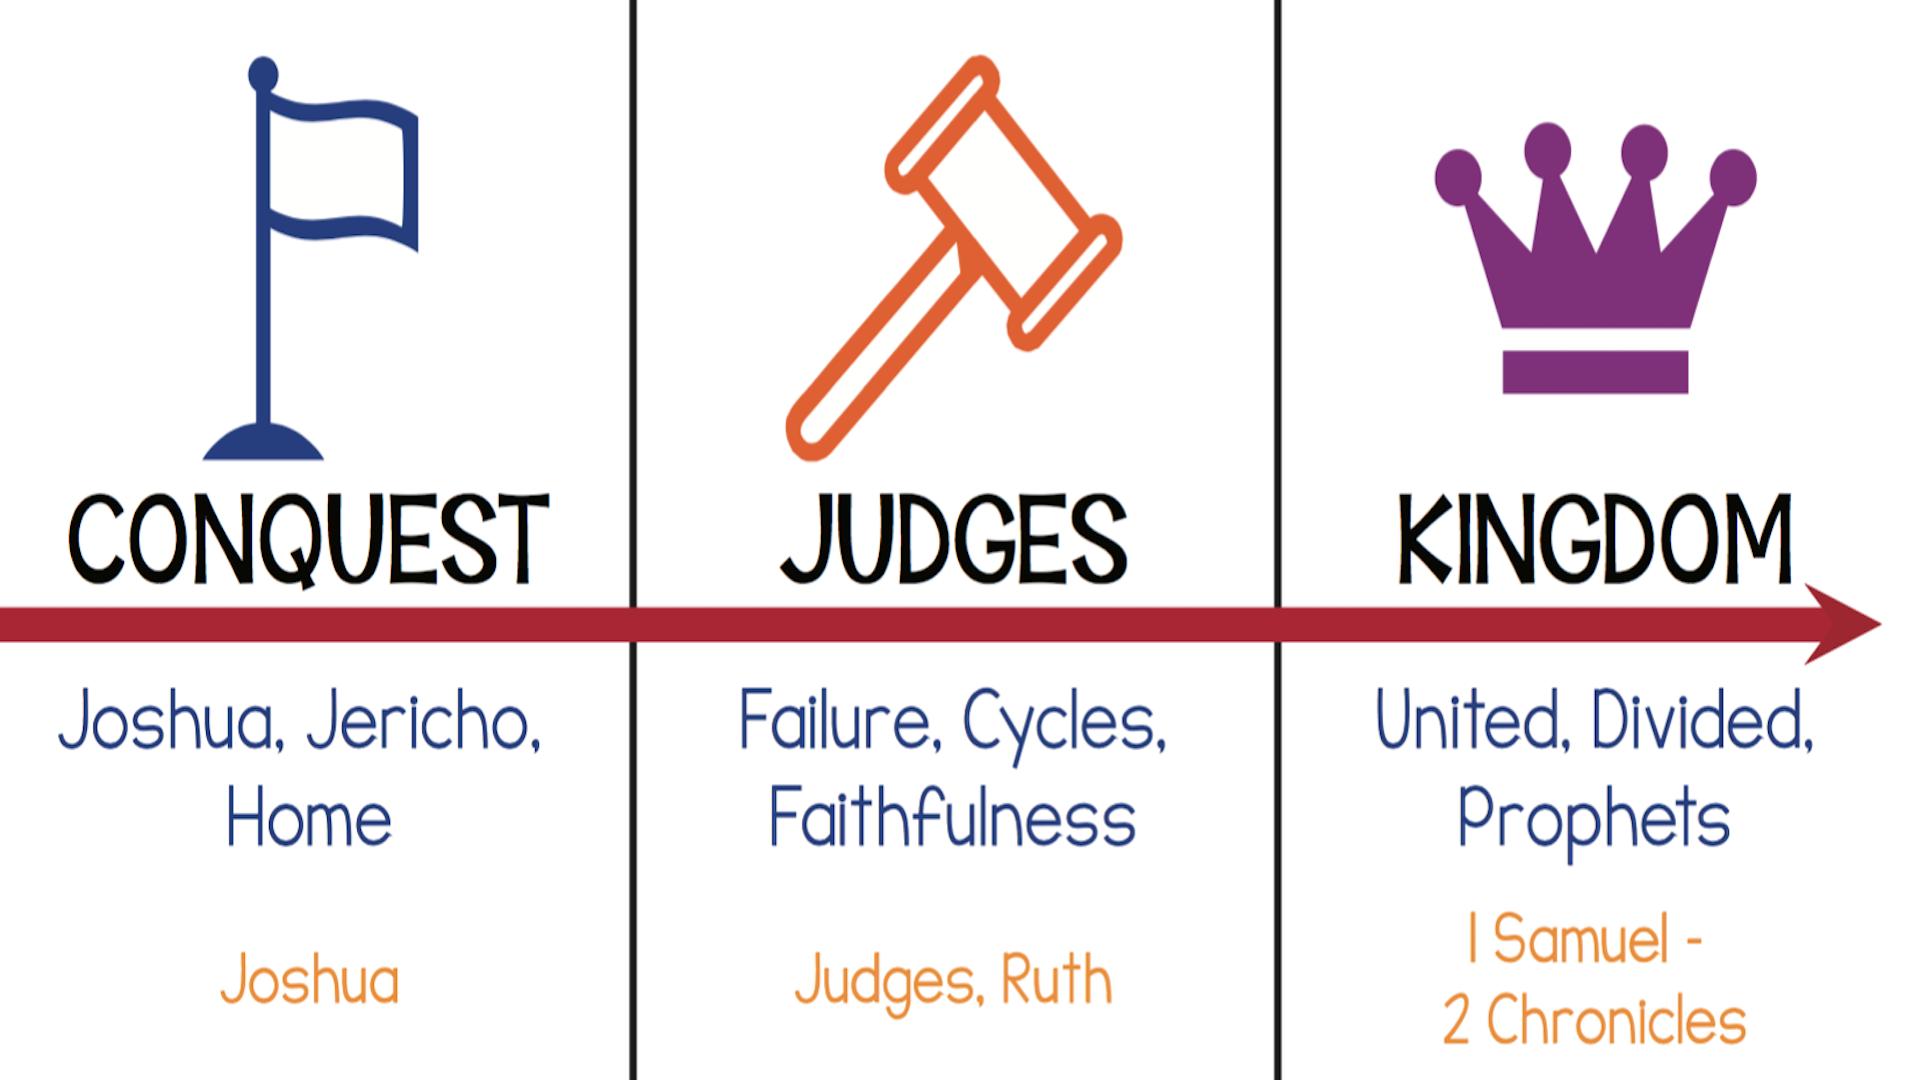 TIMELINE WEEKEND: Conquest, Judges, Kingdom Hero Image